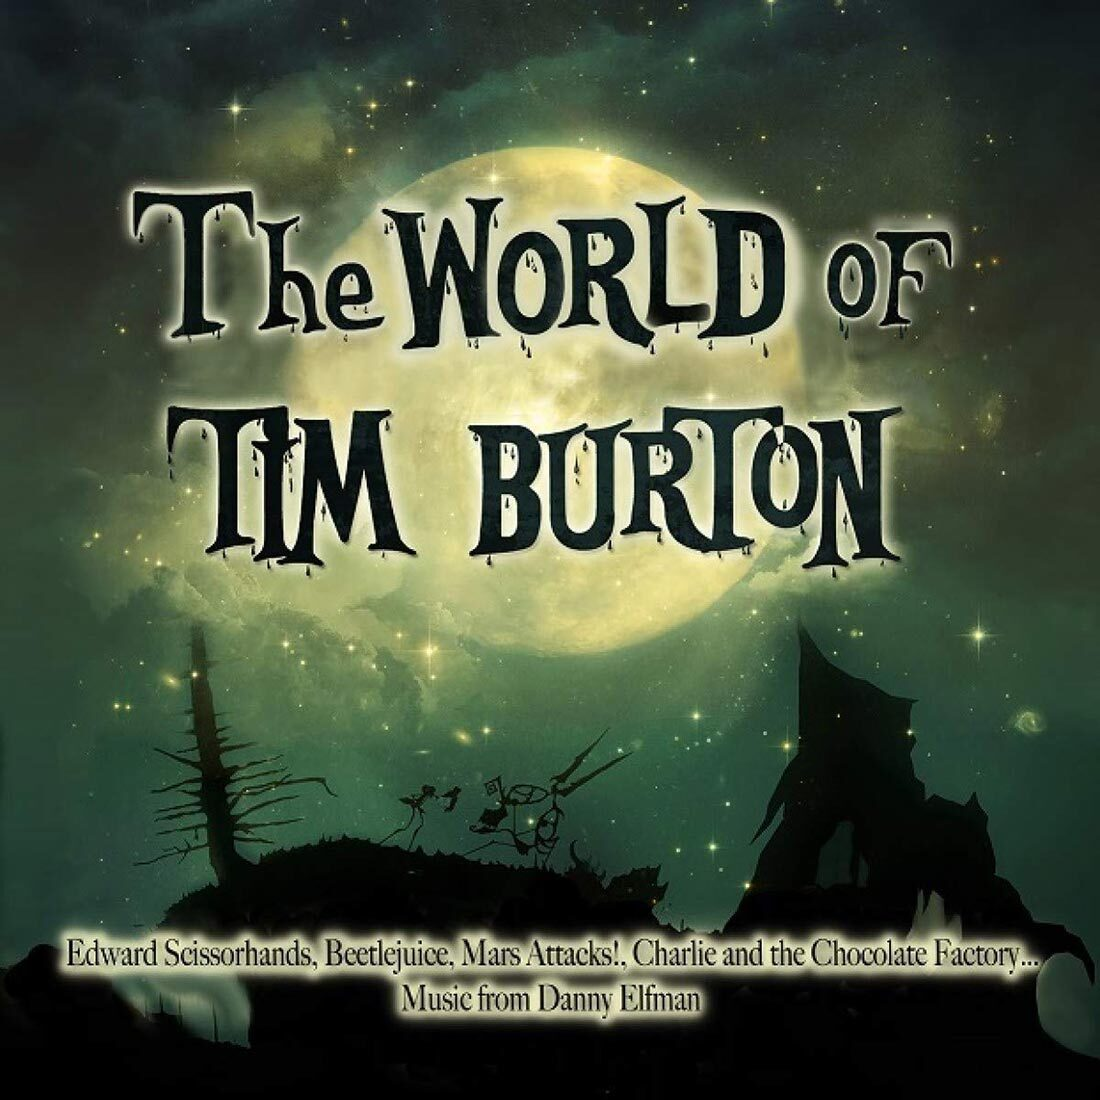 The World of Tim Burton 2-Disc Limited Vinyl Soundtracks Edition